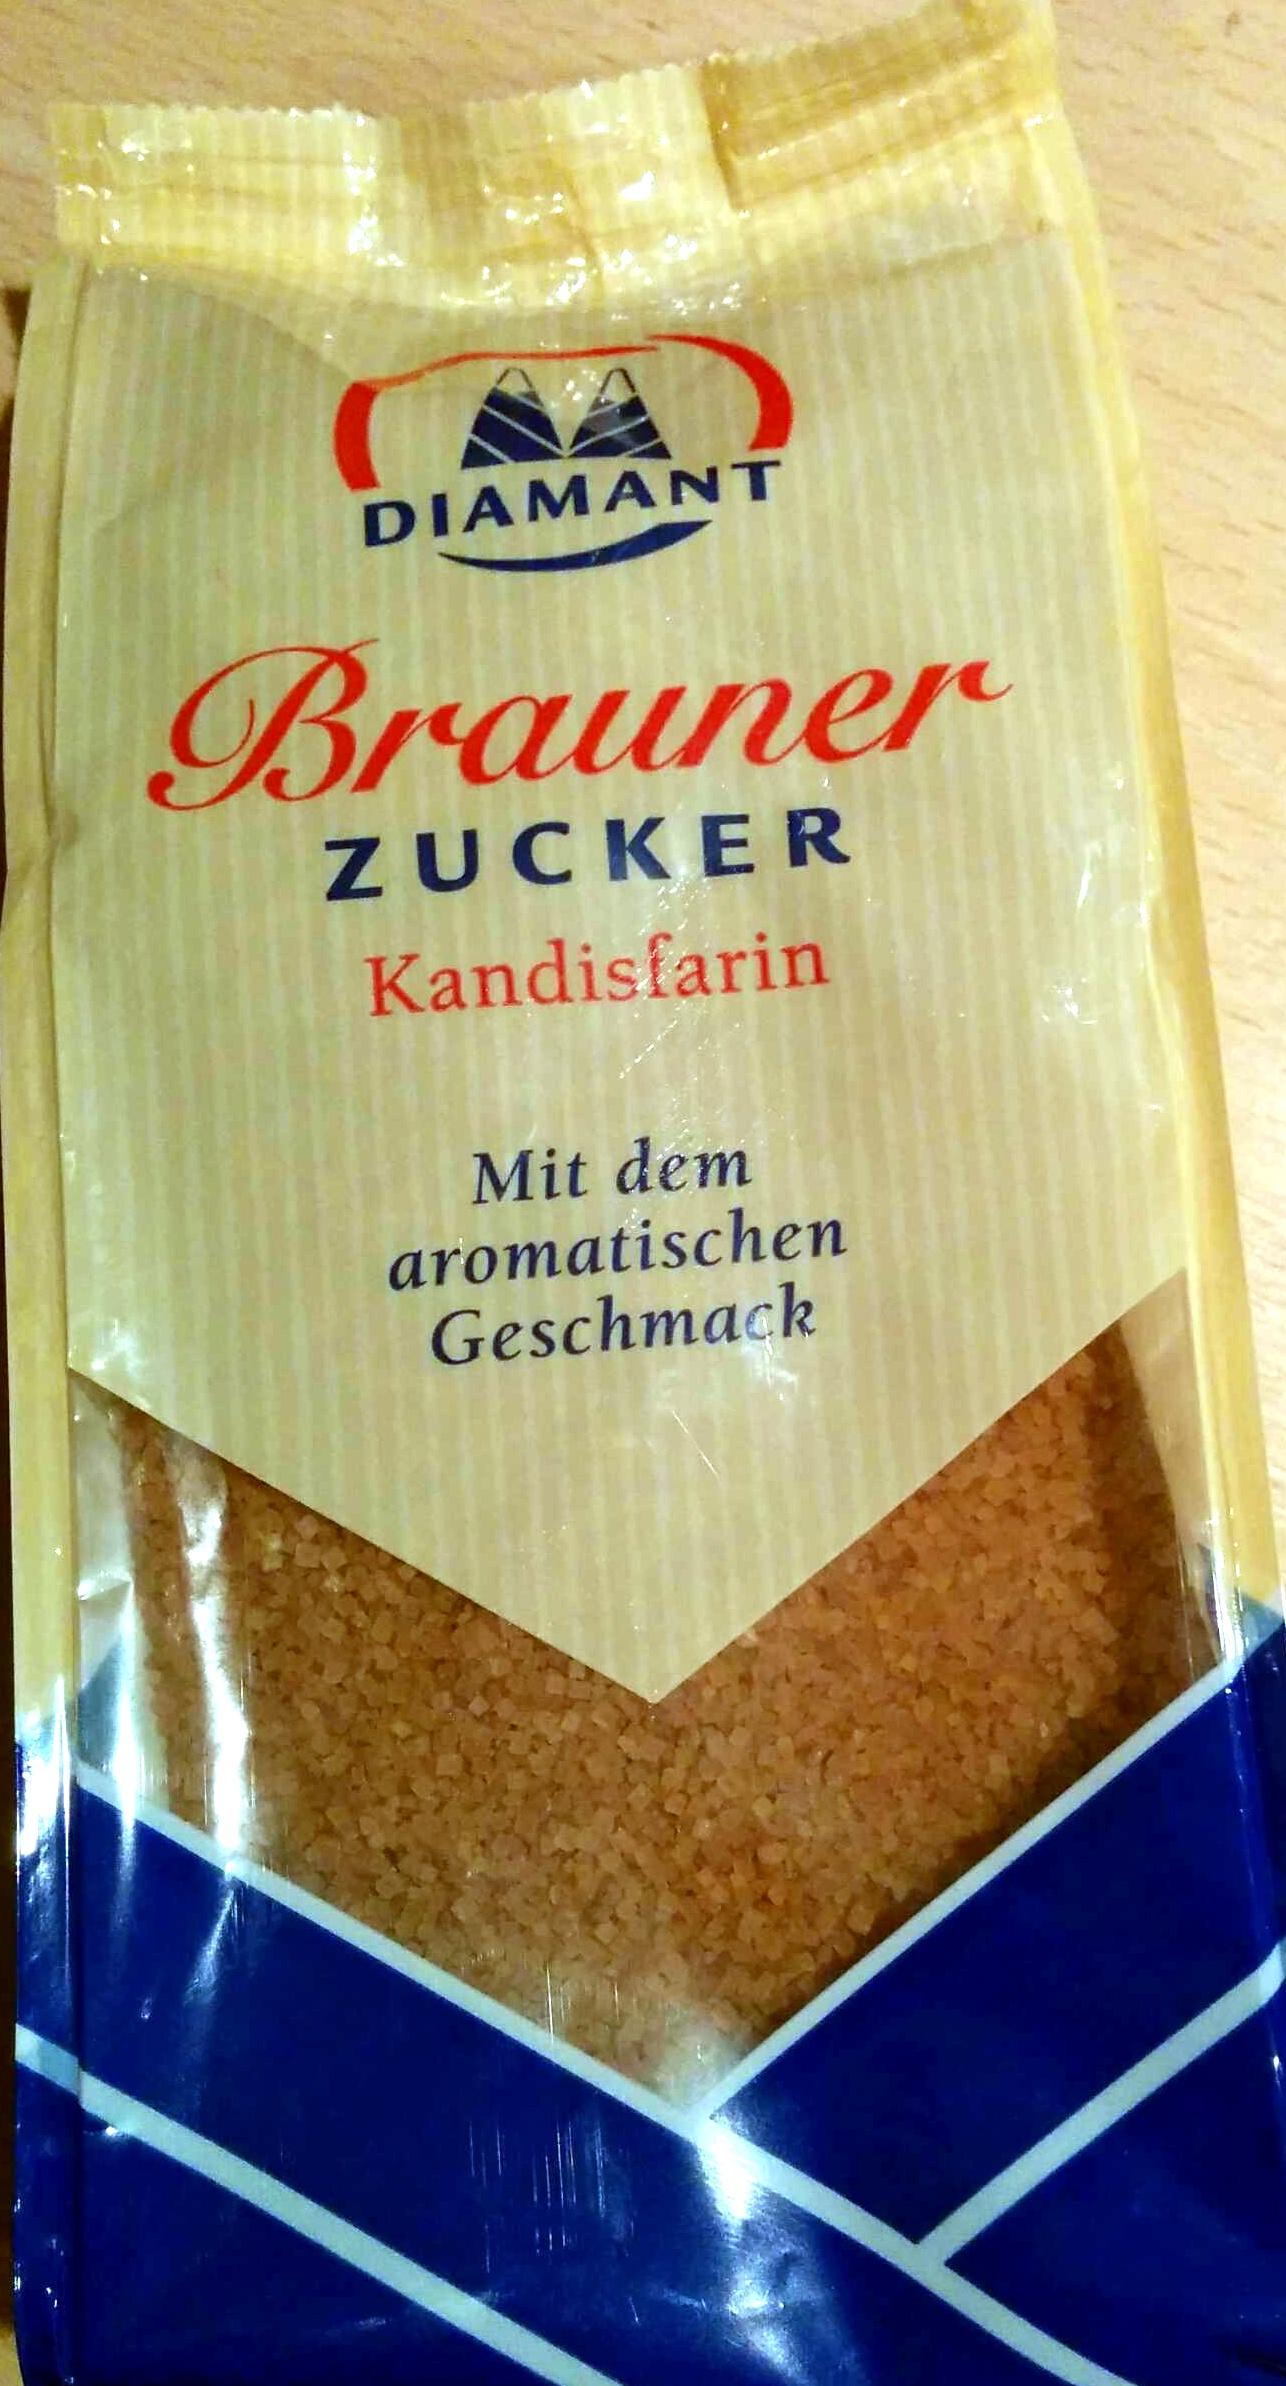 Brauner Zucker Kandisfarin - Product - de